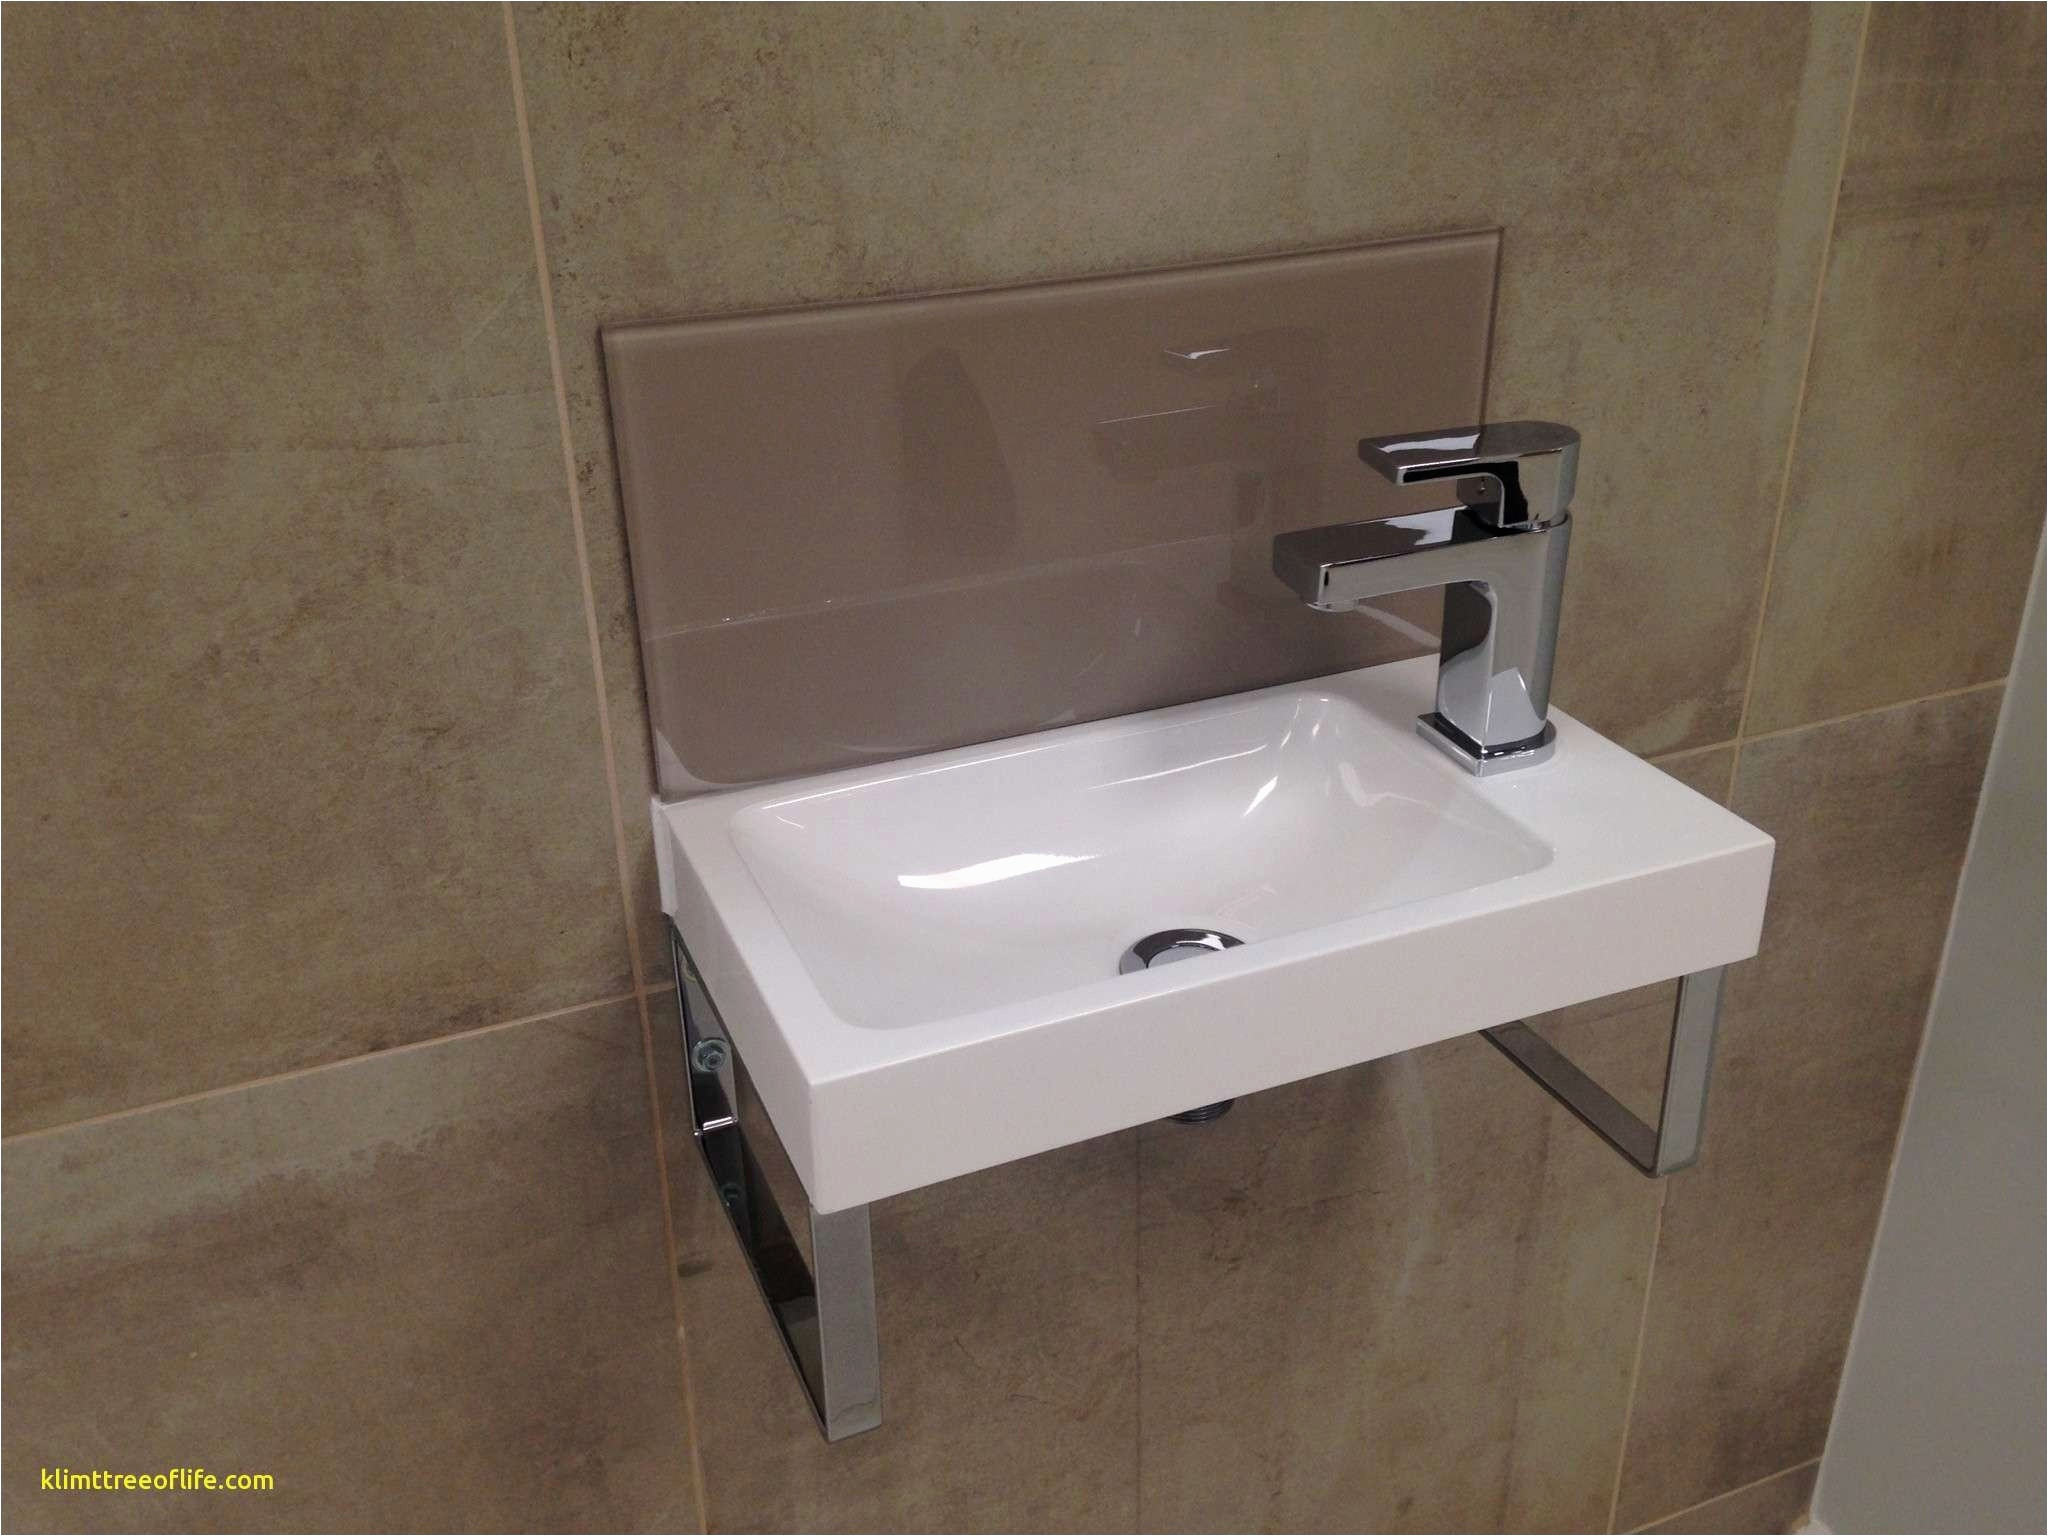 Bathroom Tile Design Ideas for Small Bathrooms Bathroom Designs Bathroom Tile Designs for Small Bathrooms Tile